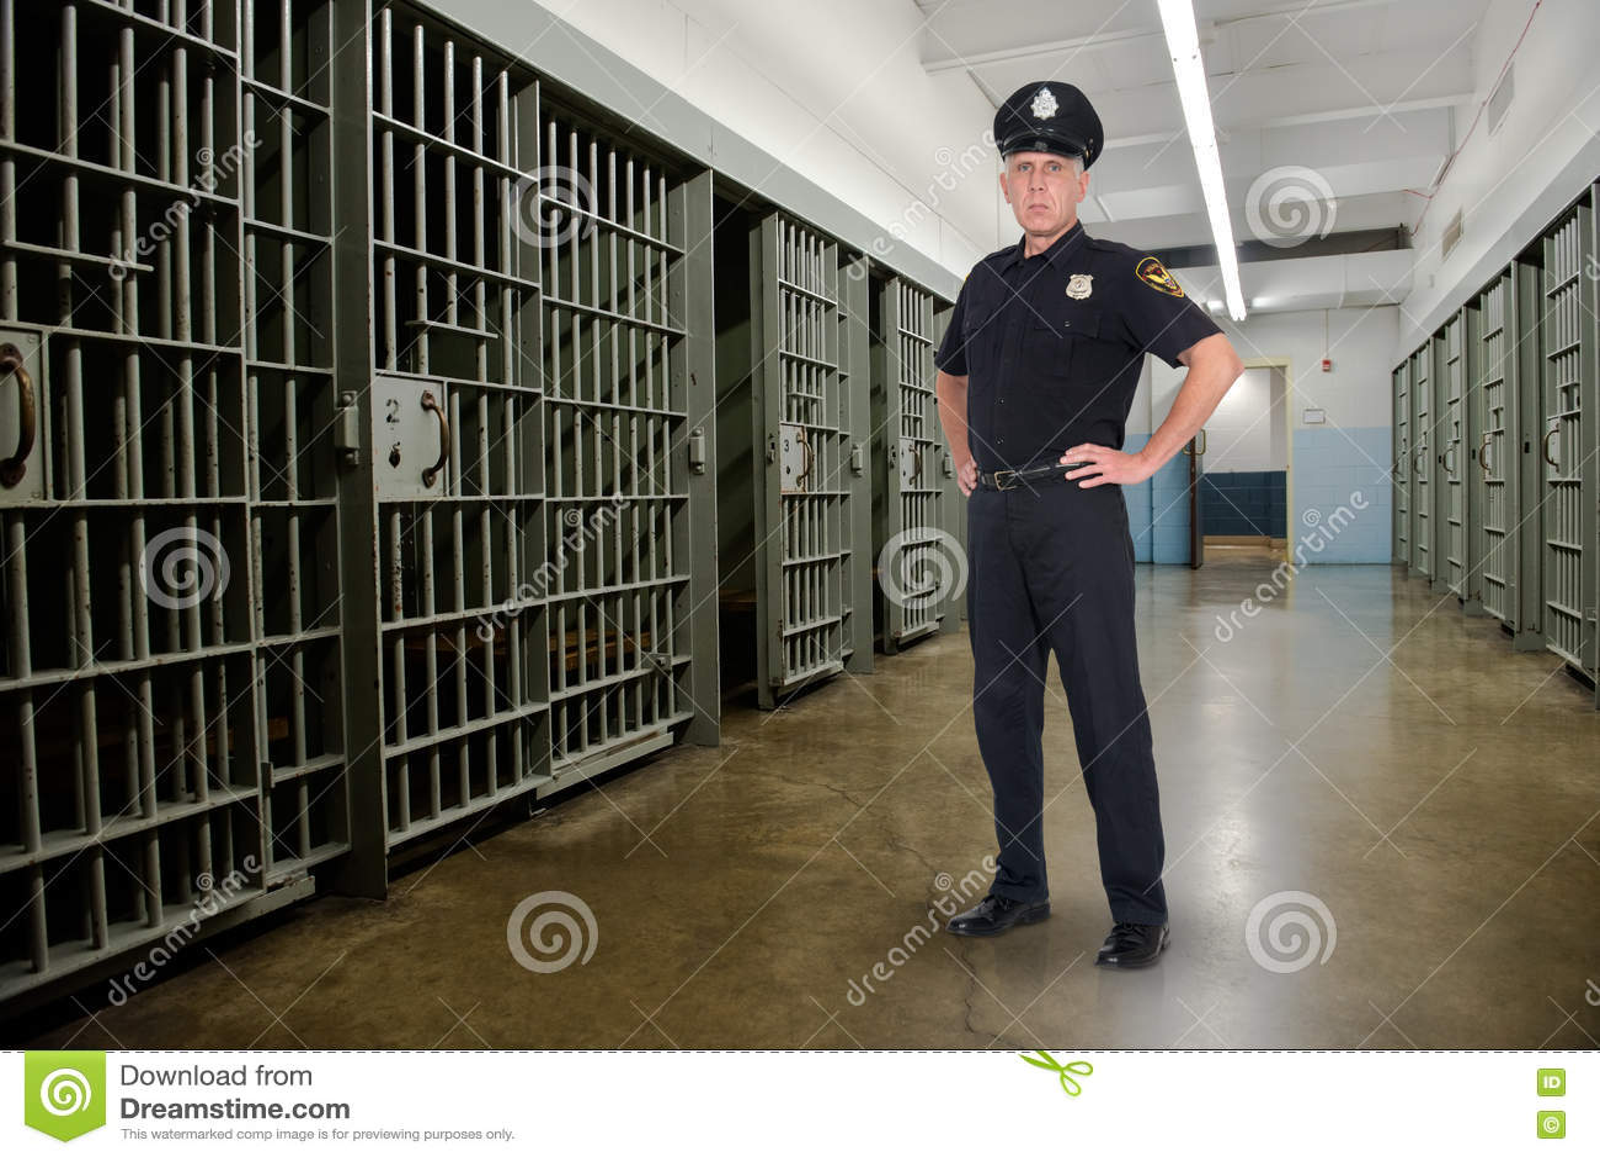 Gevangenis, Gevangenis, Wetshandhaving, Politie